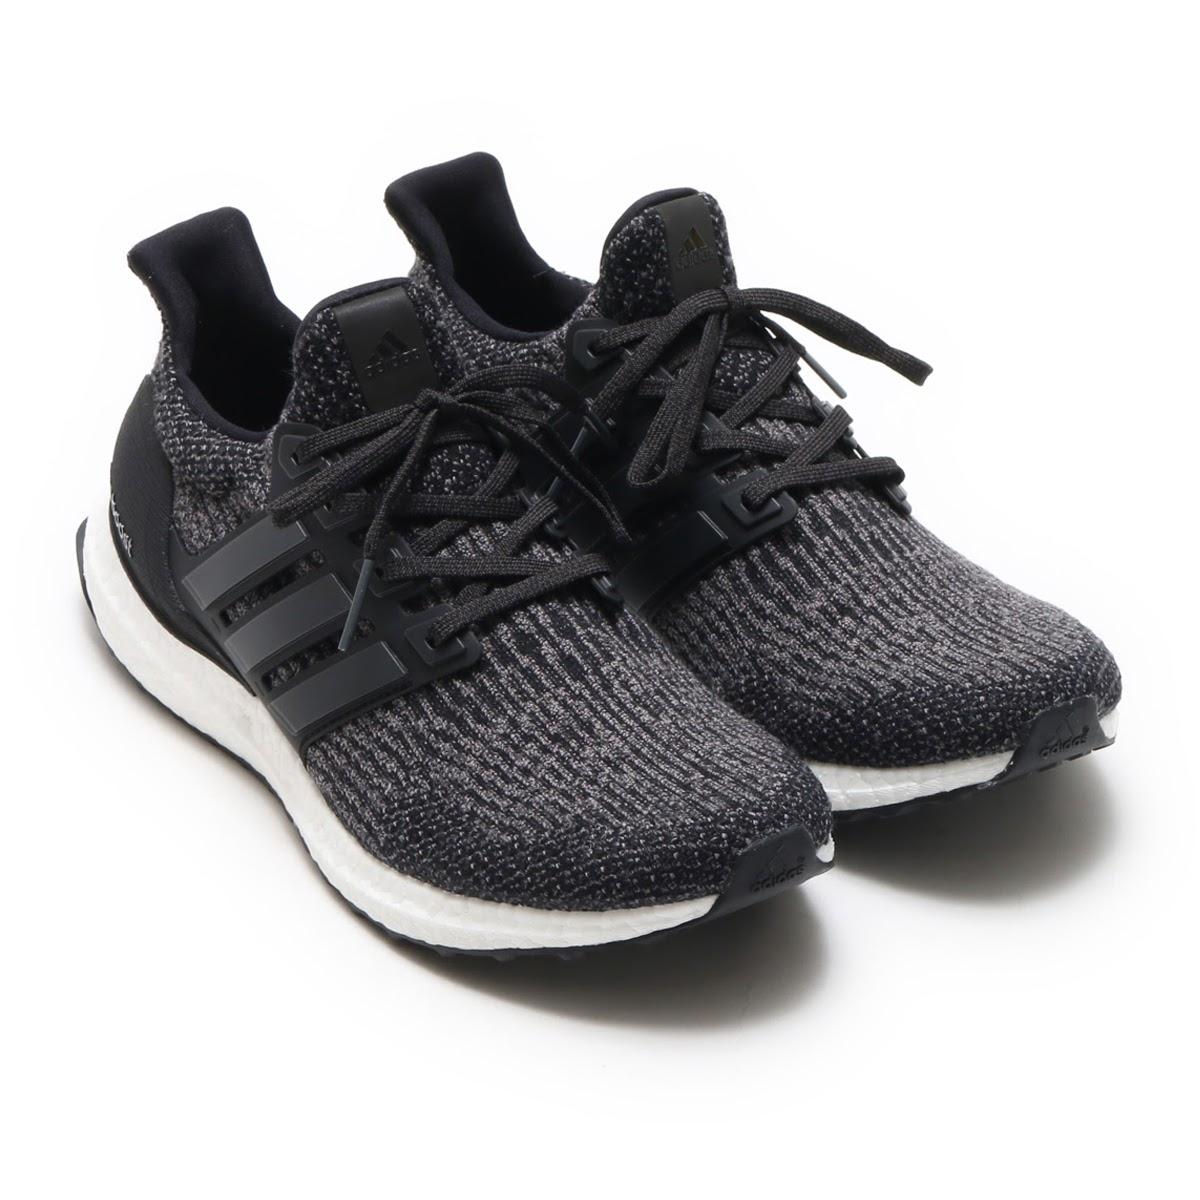 7fd3dd759882a adidas Originals Ultra BOOST WOOL (Adidas originals ultra boost wool) Core  Black Black Utility Black 17FW-S